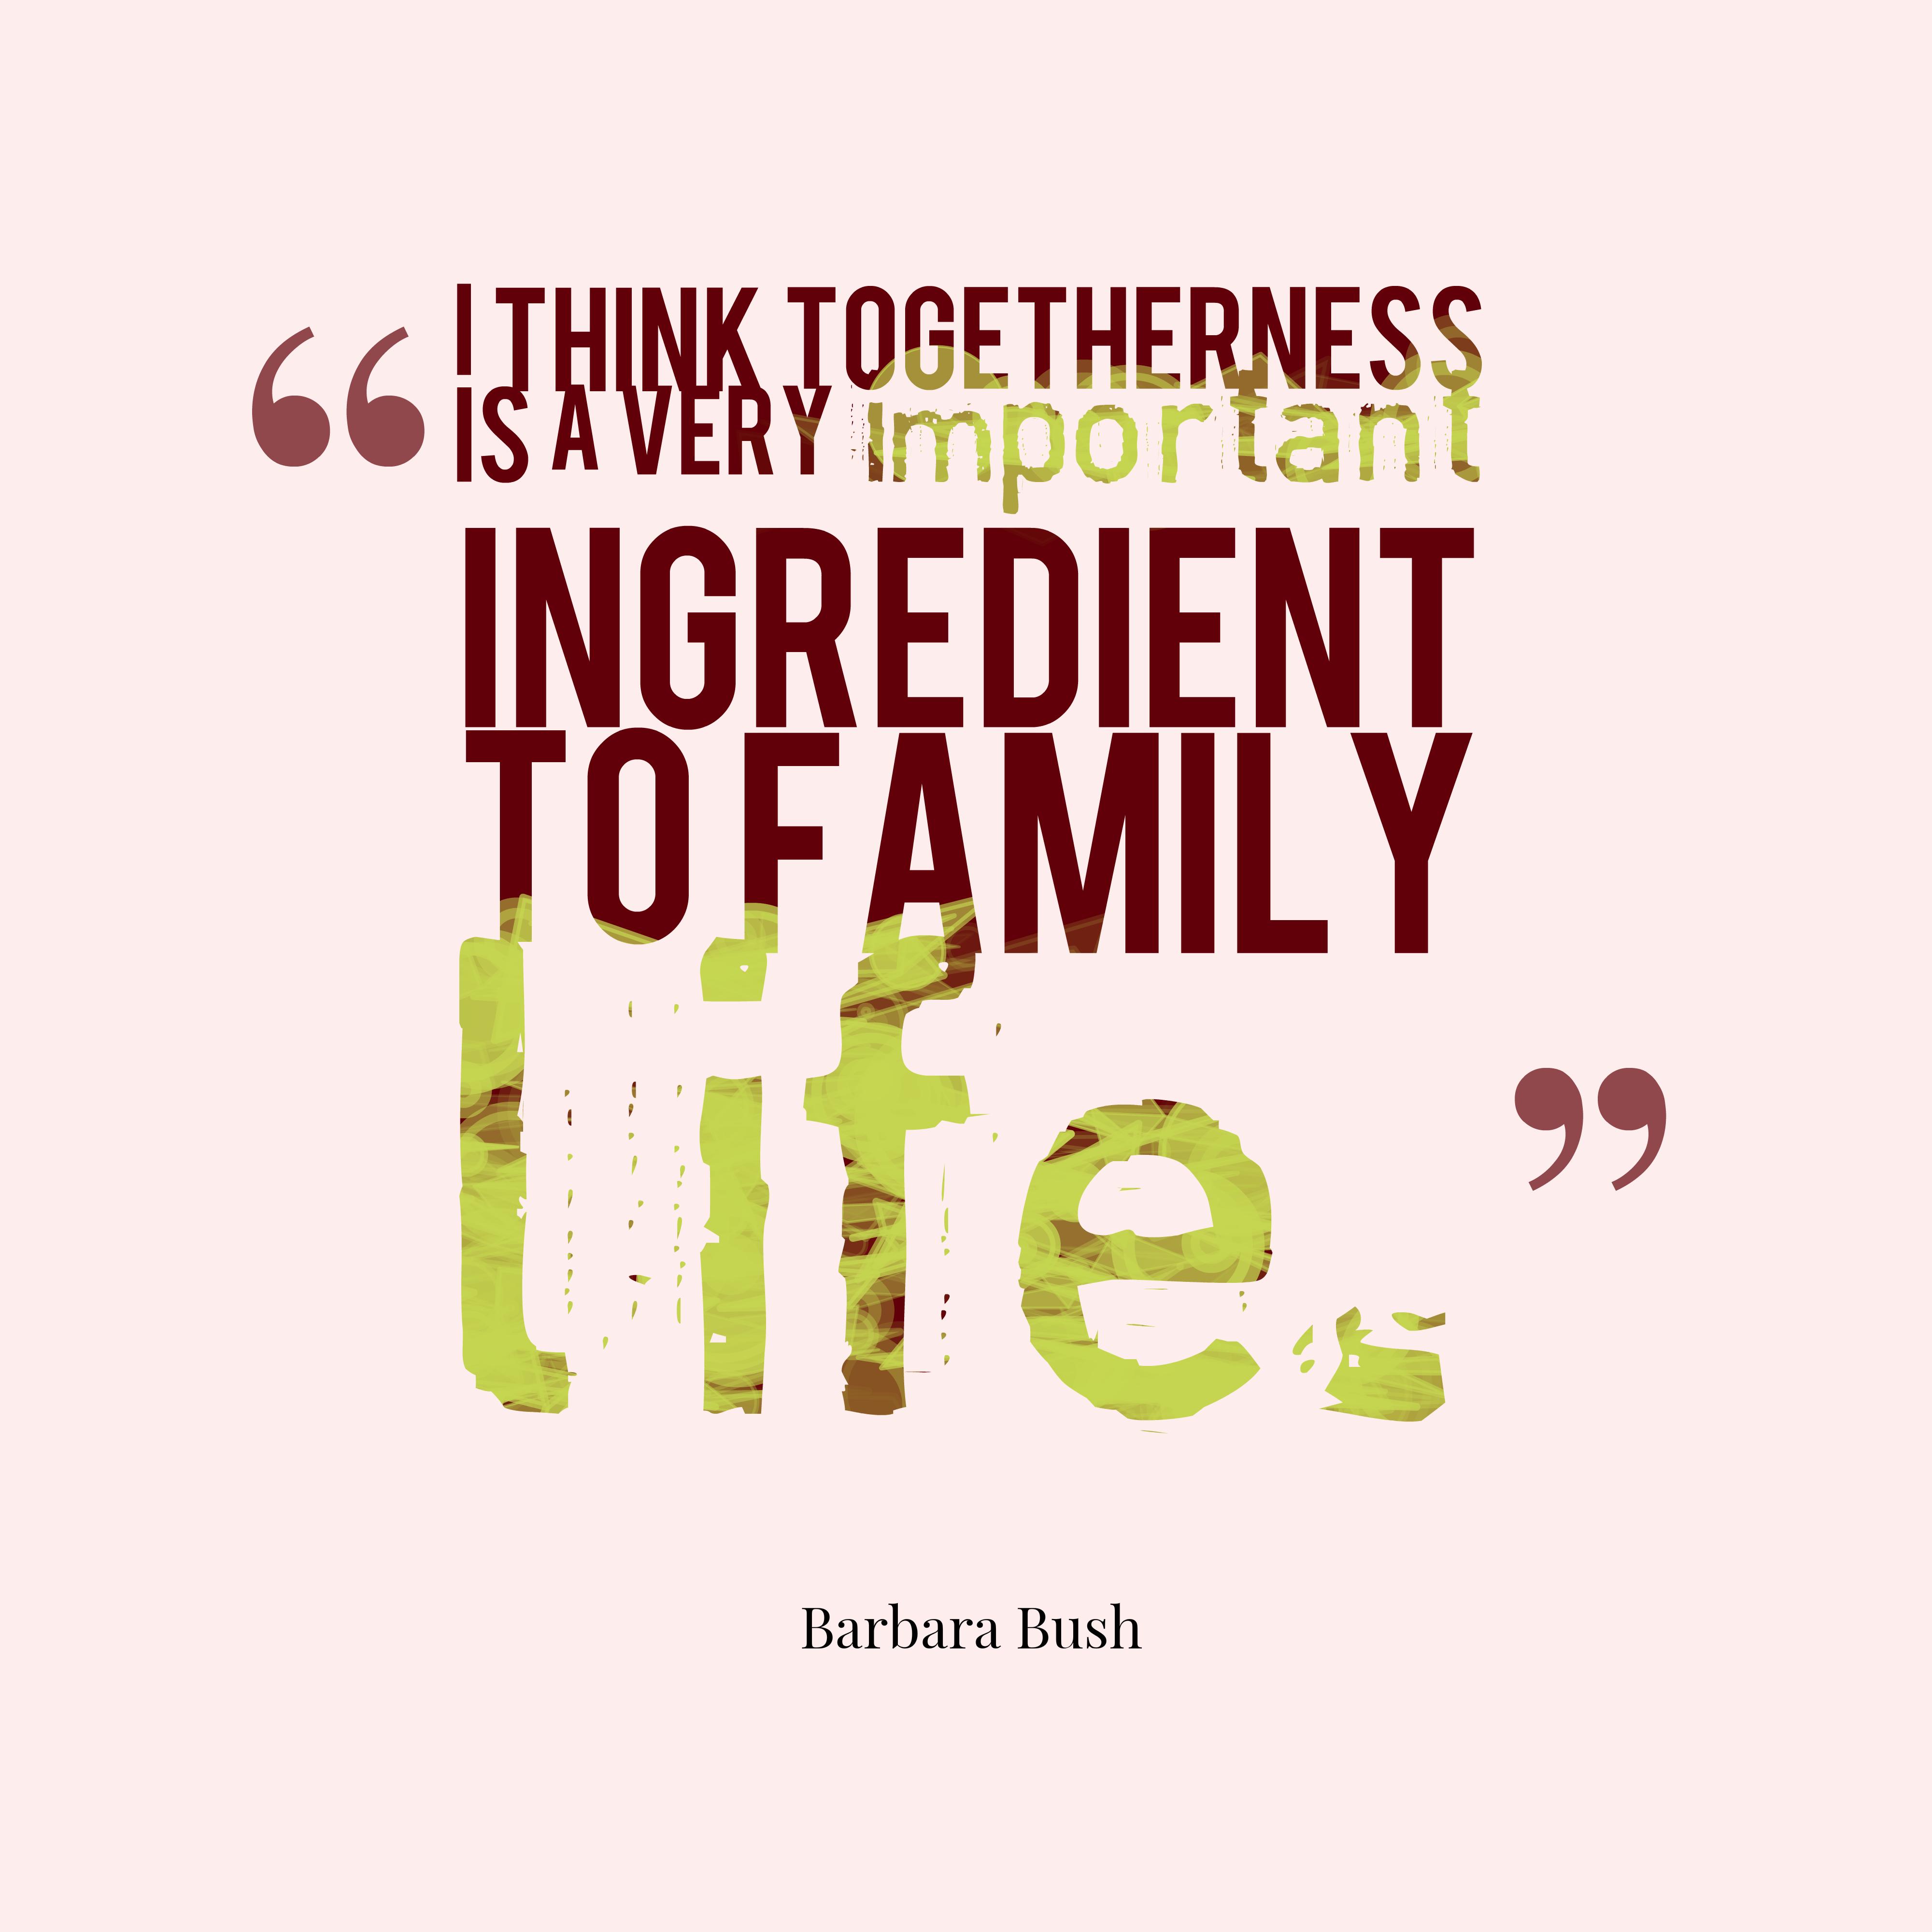 Barbara Bush quote about family.